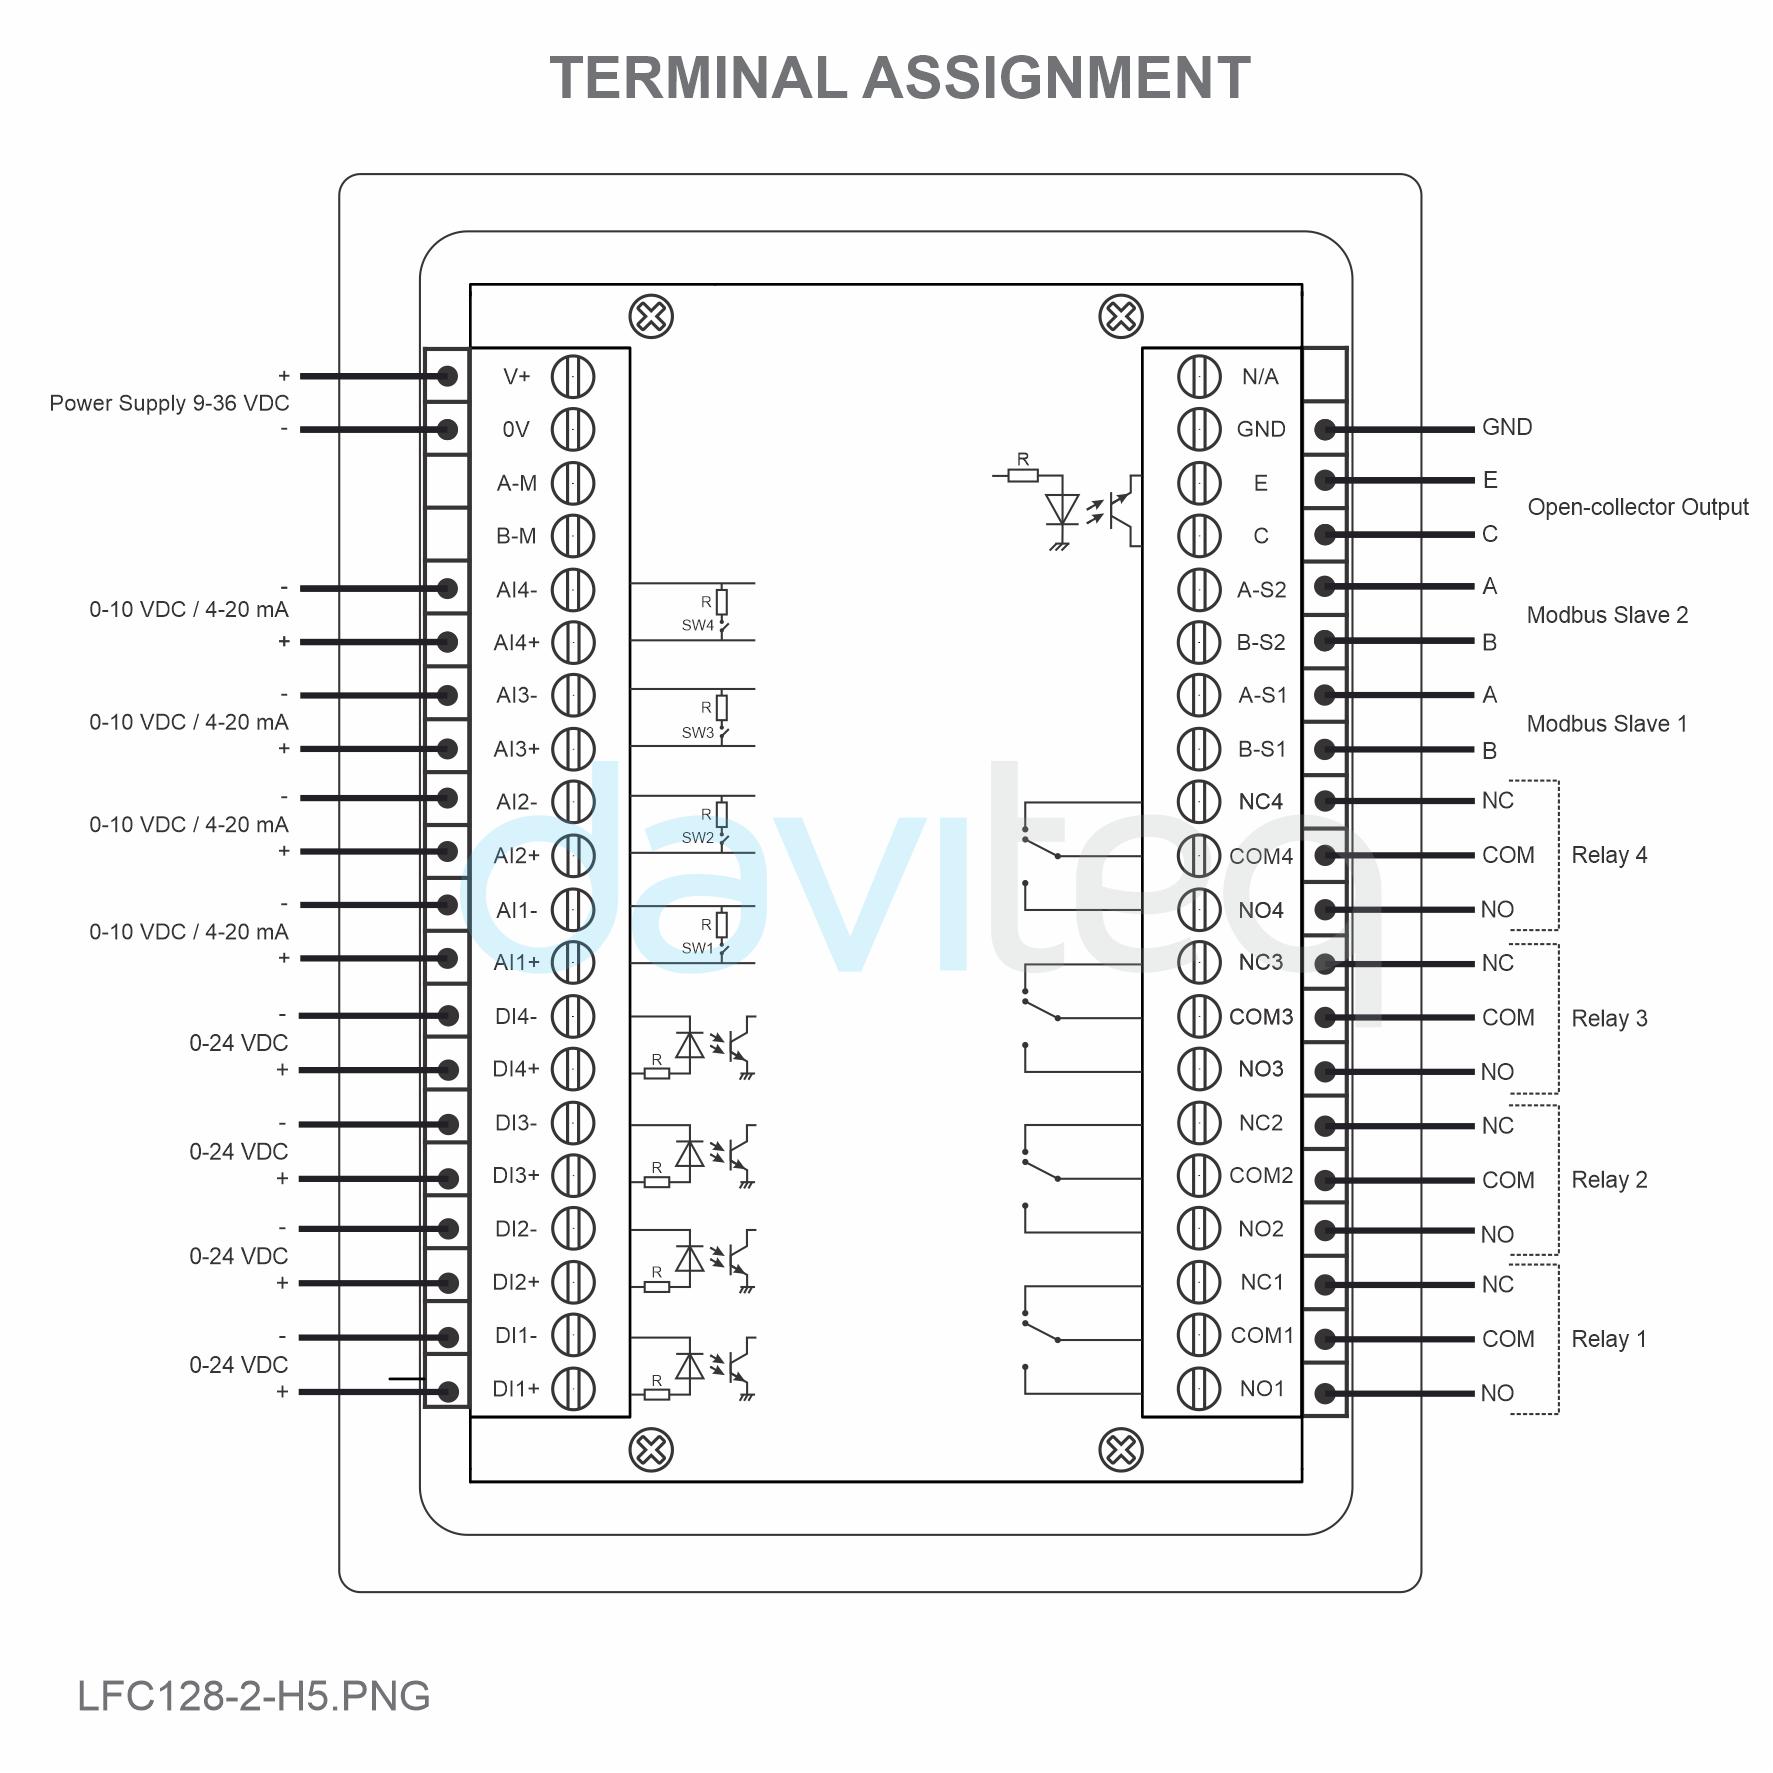 LFC128-2-H5.png